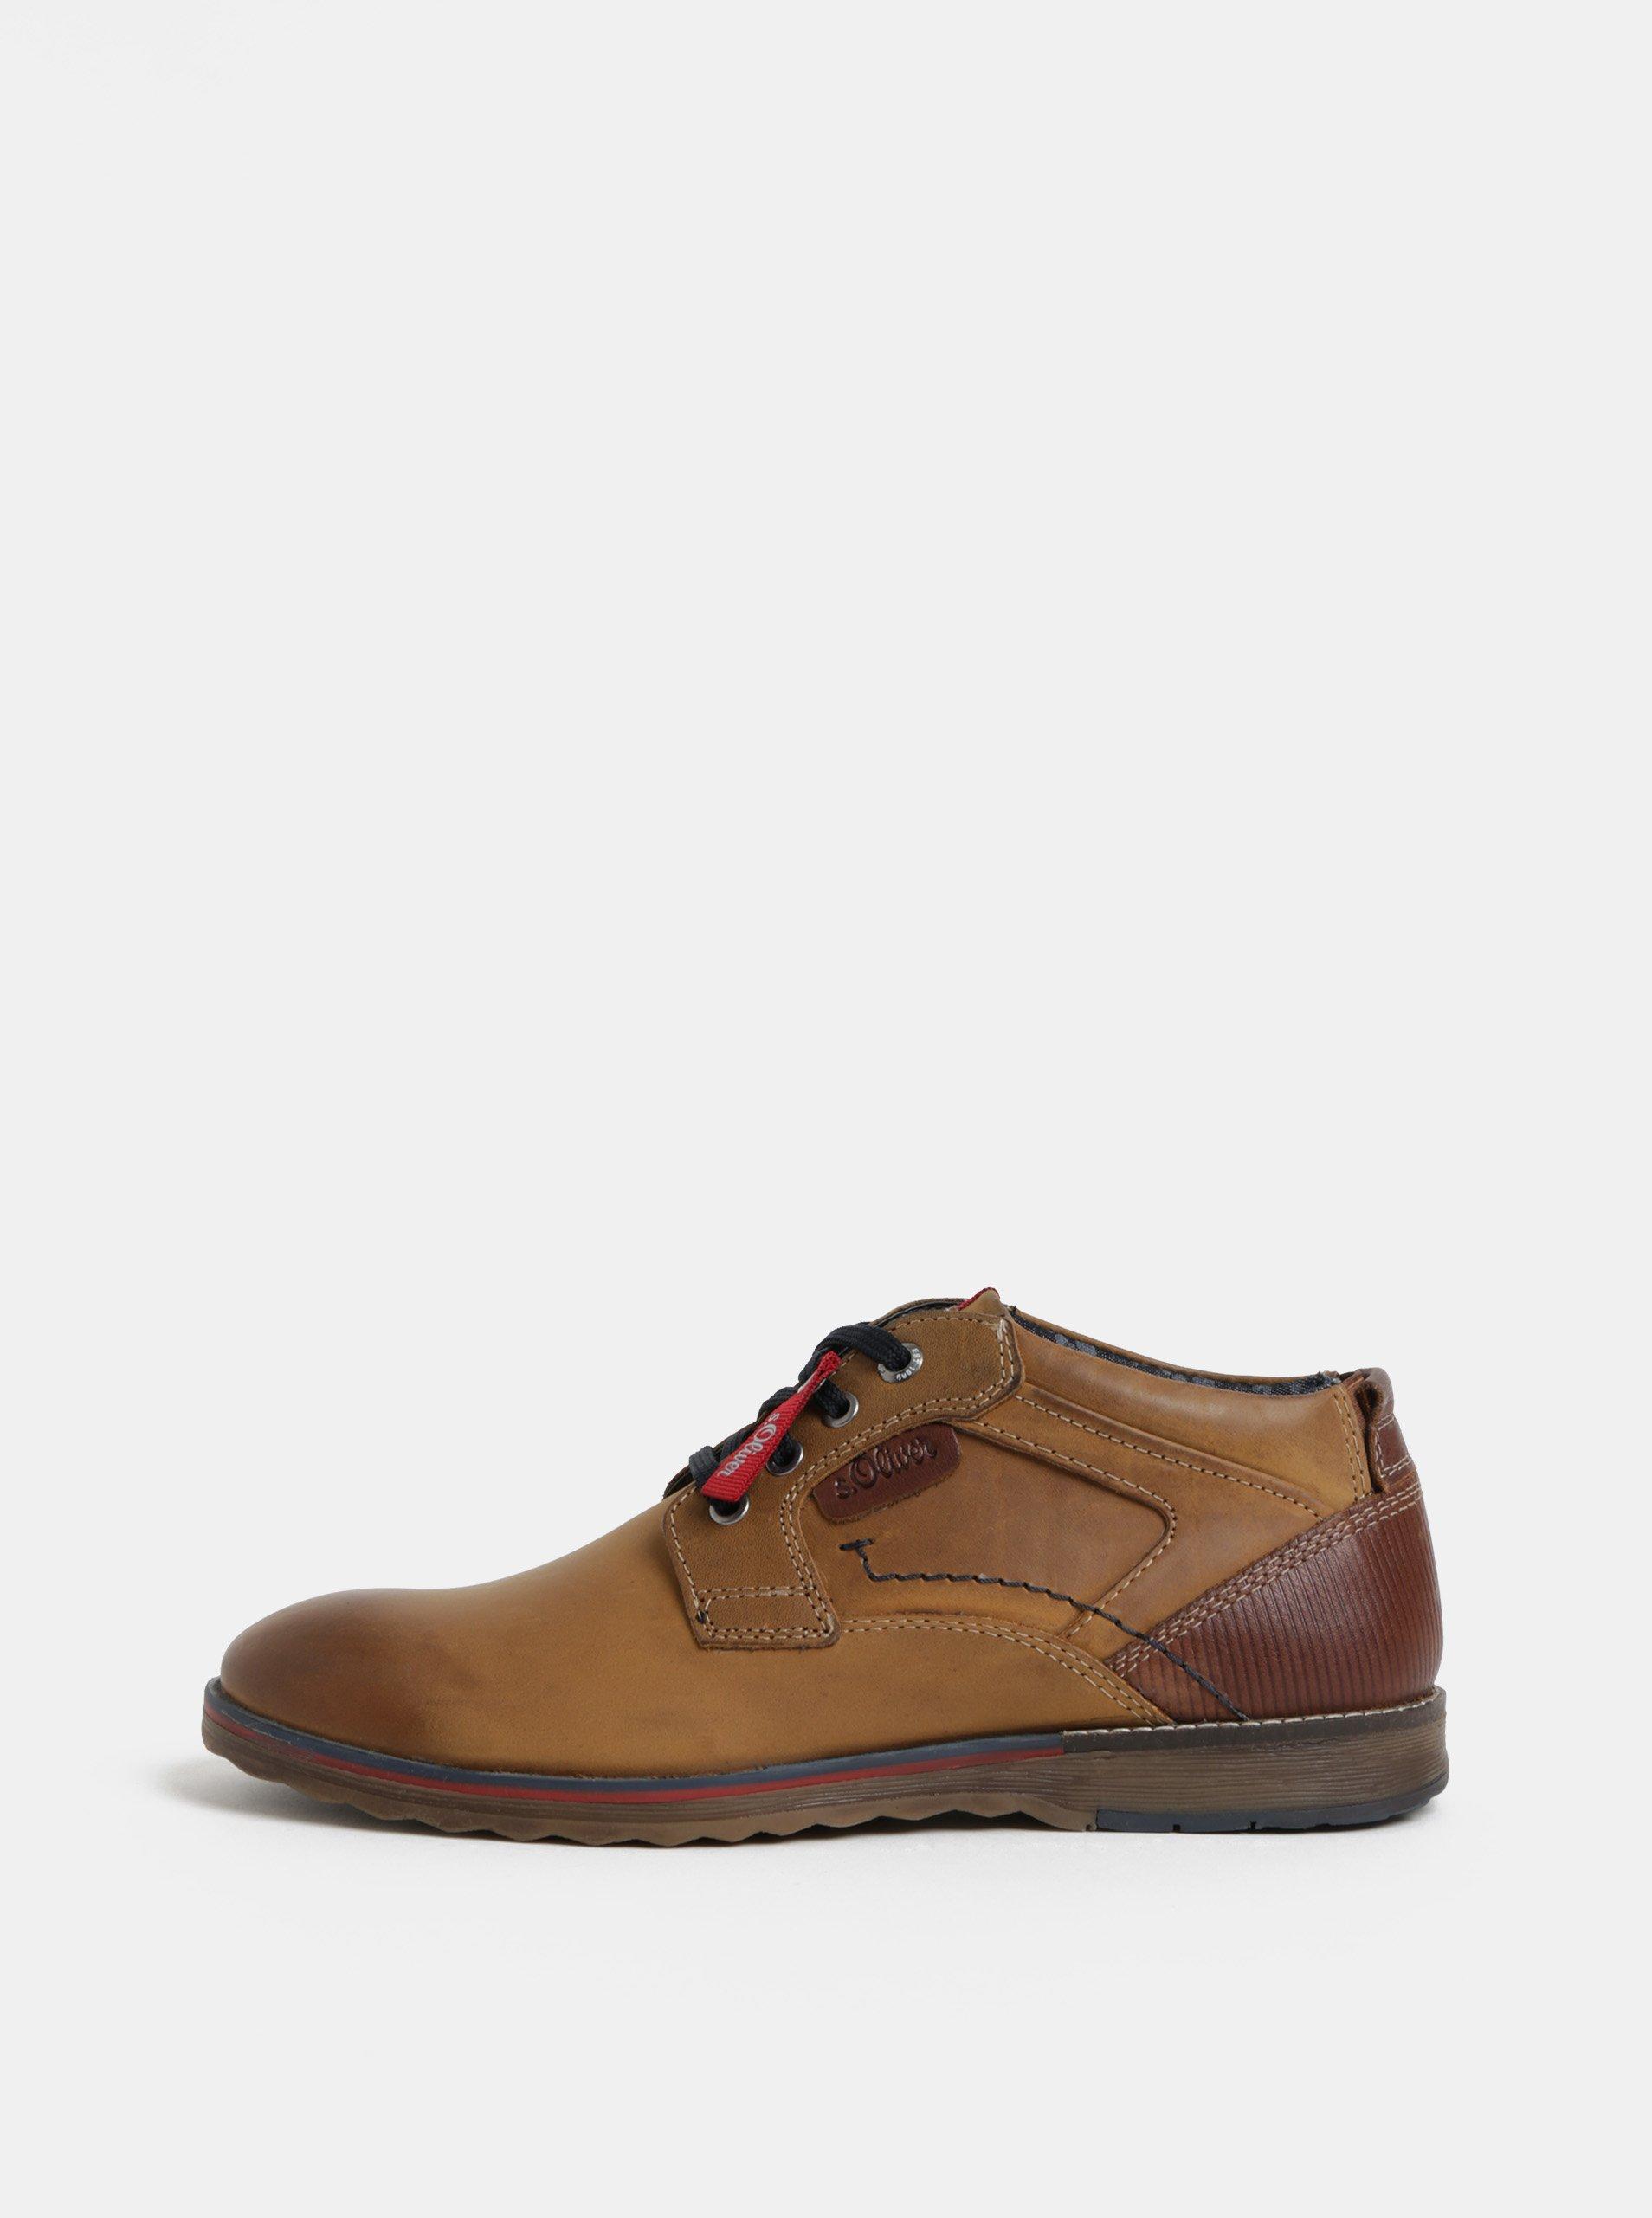 Hnedé pánske kožené topánky s.Oliver